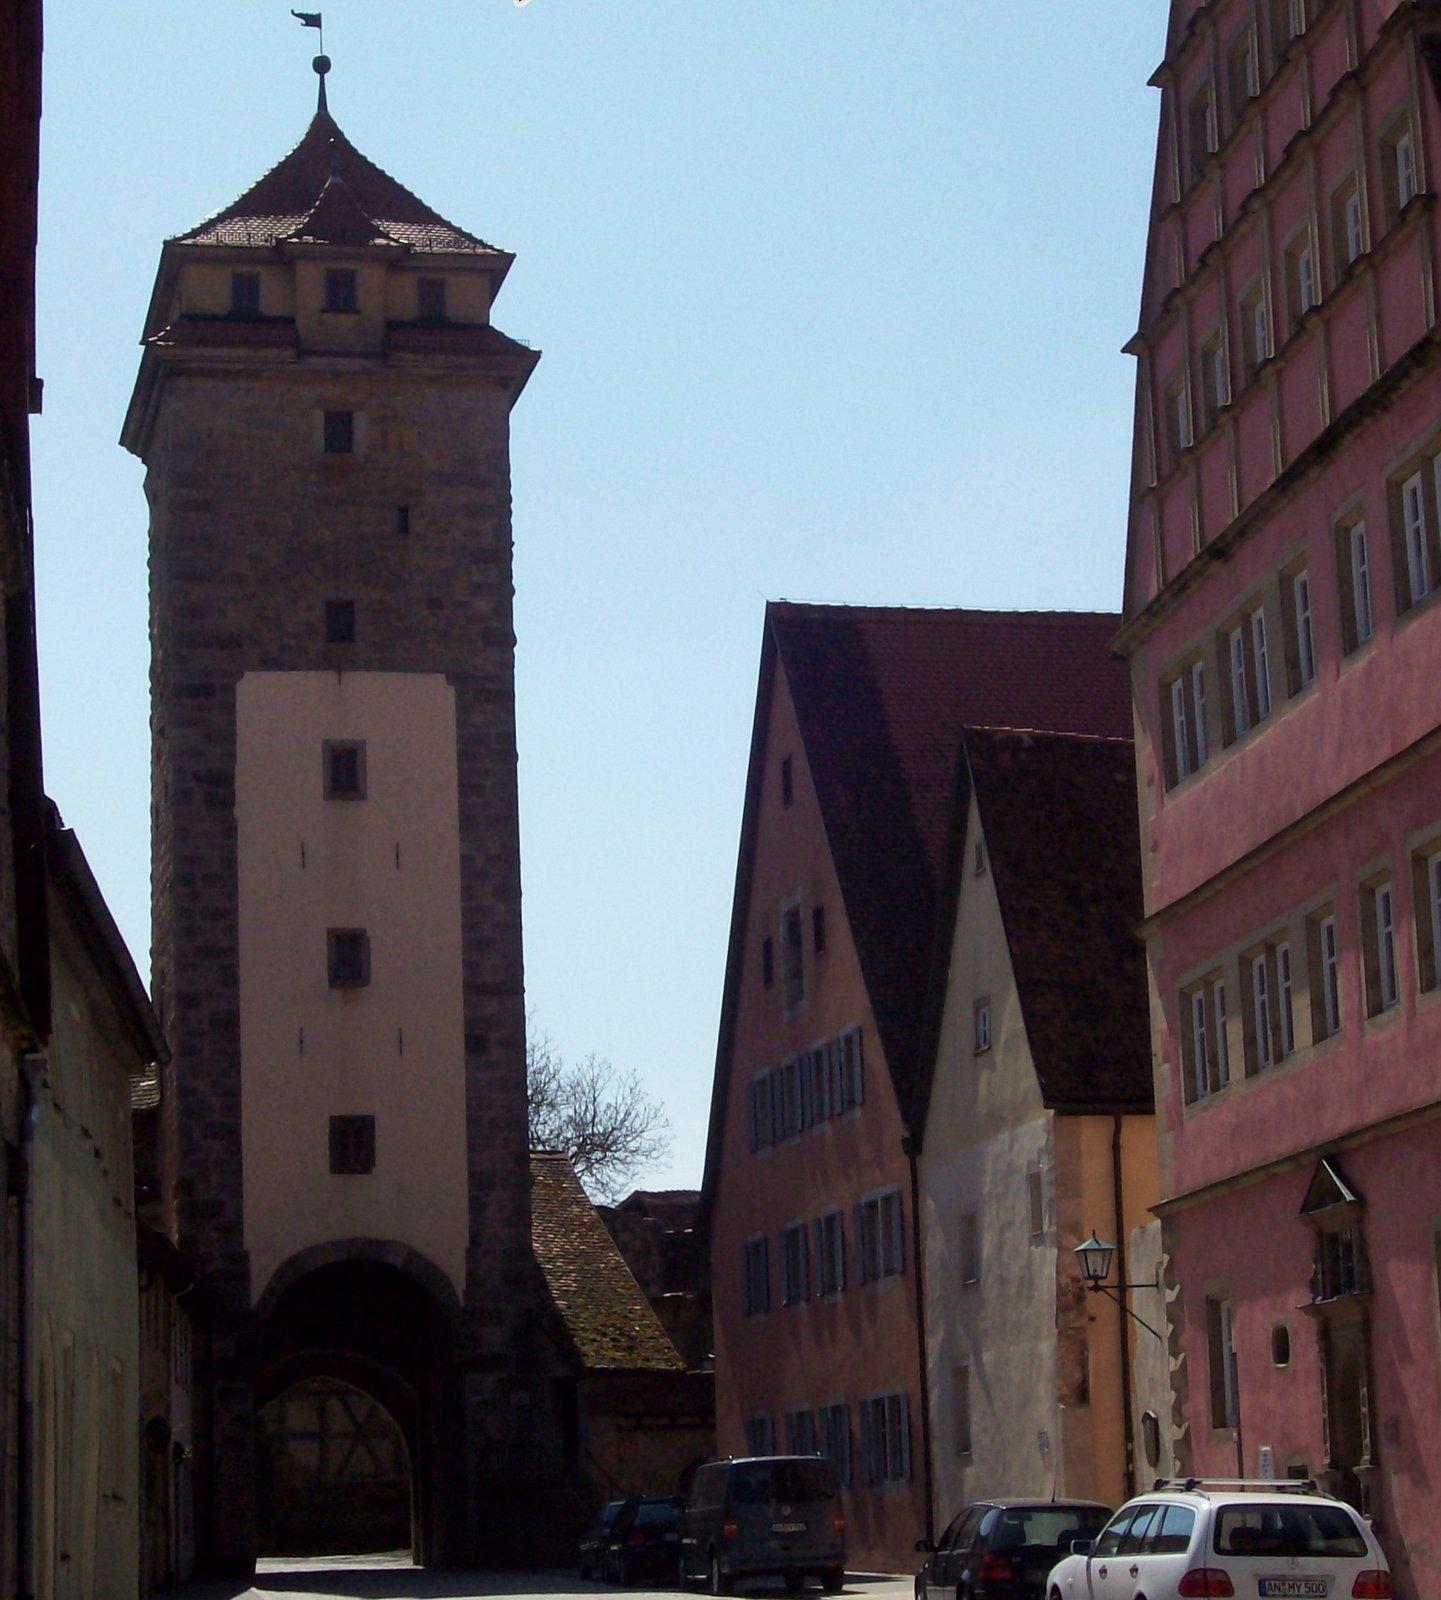 Spitalbastei Rothenburg